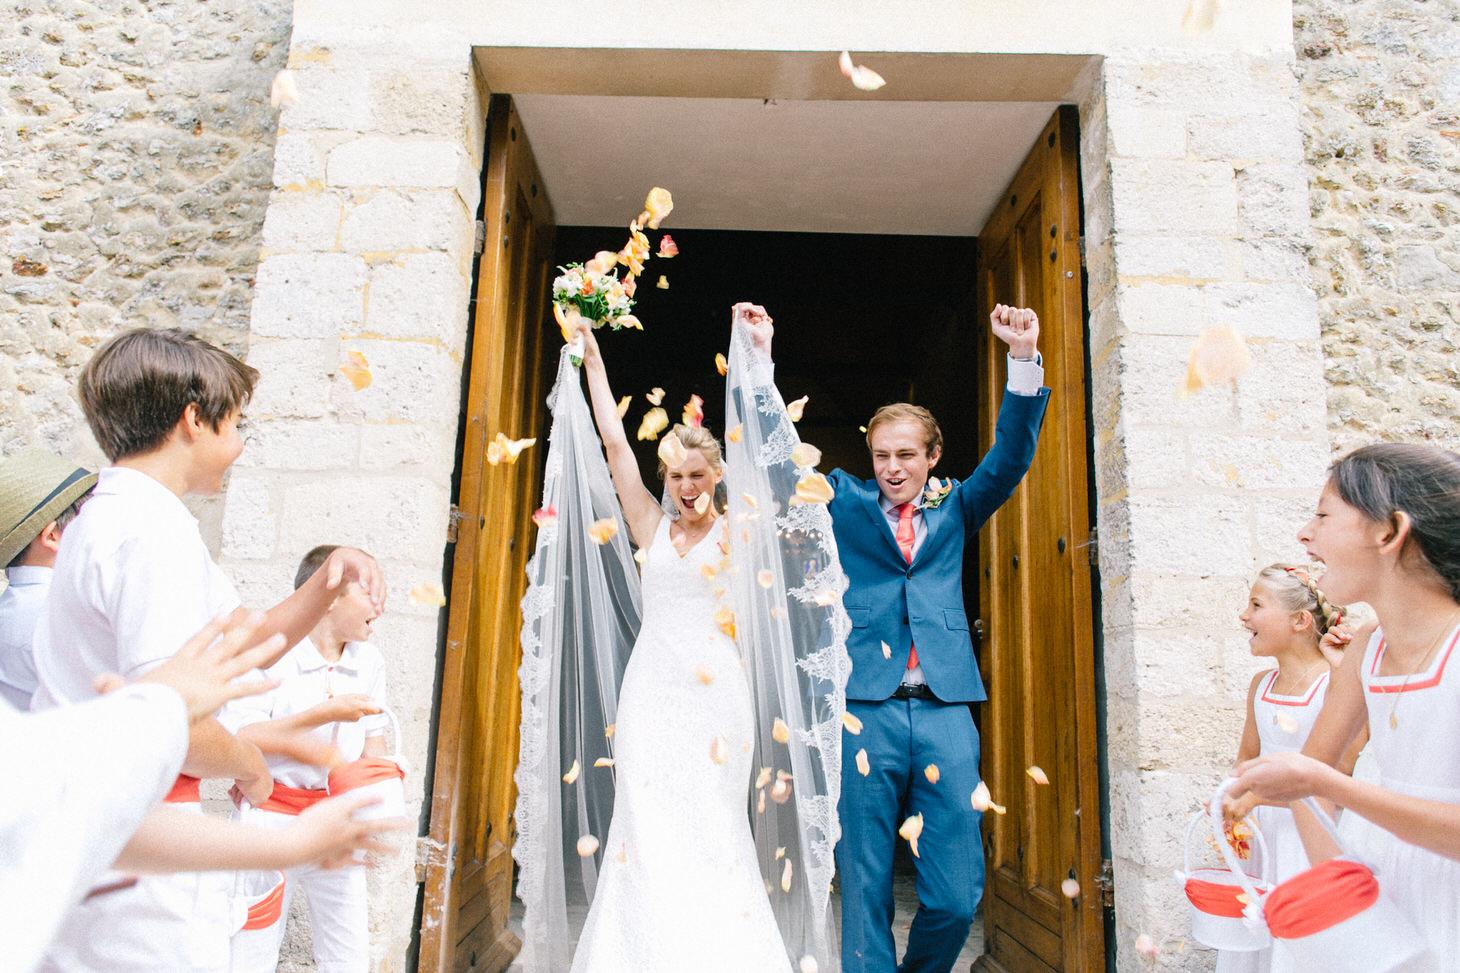 photographe-mariage-paris-montfort-l-amaury-037